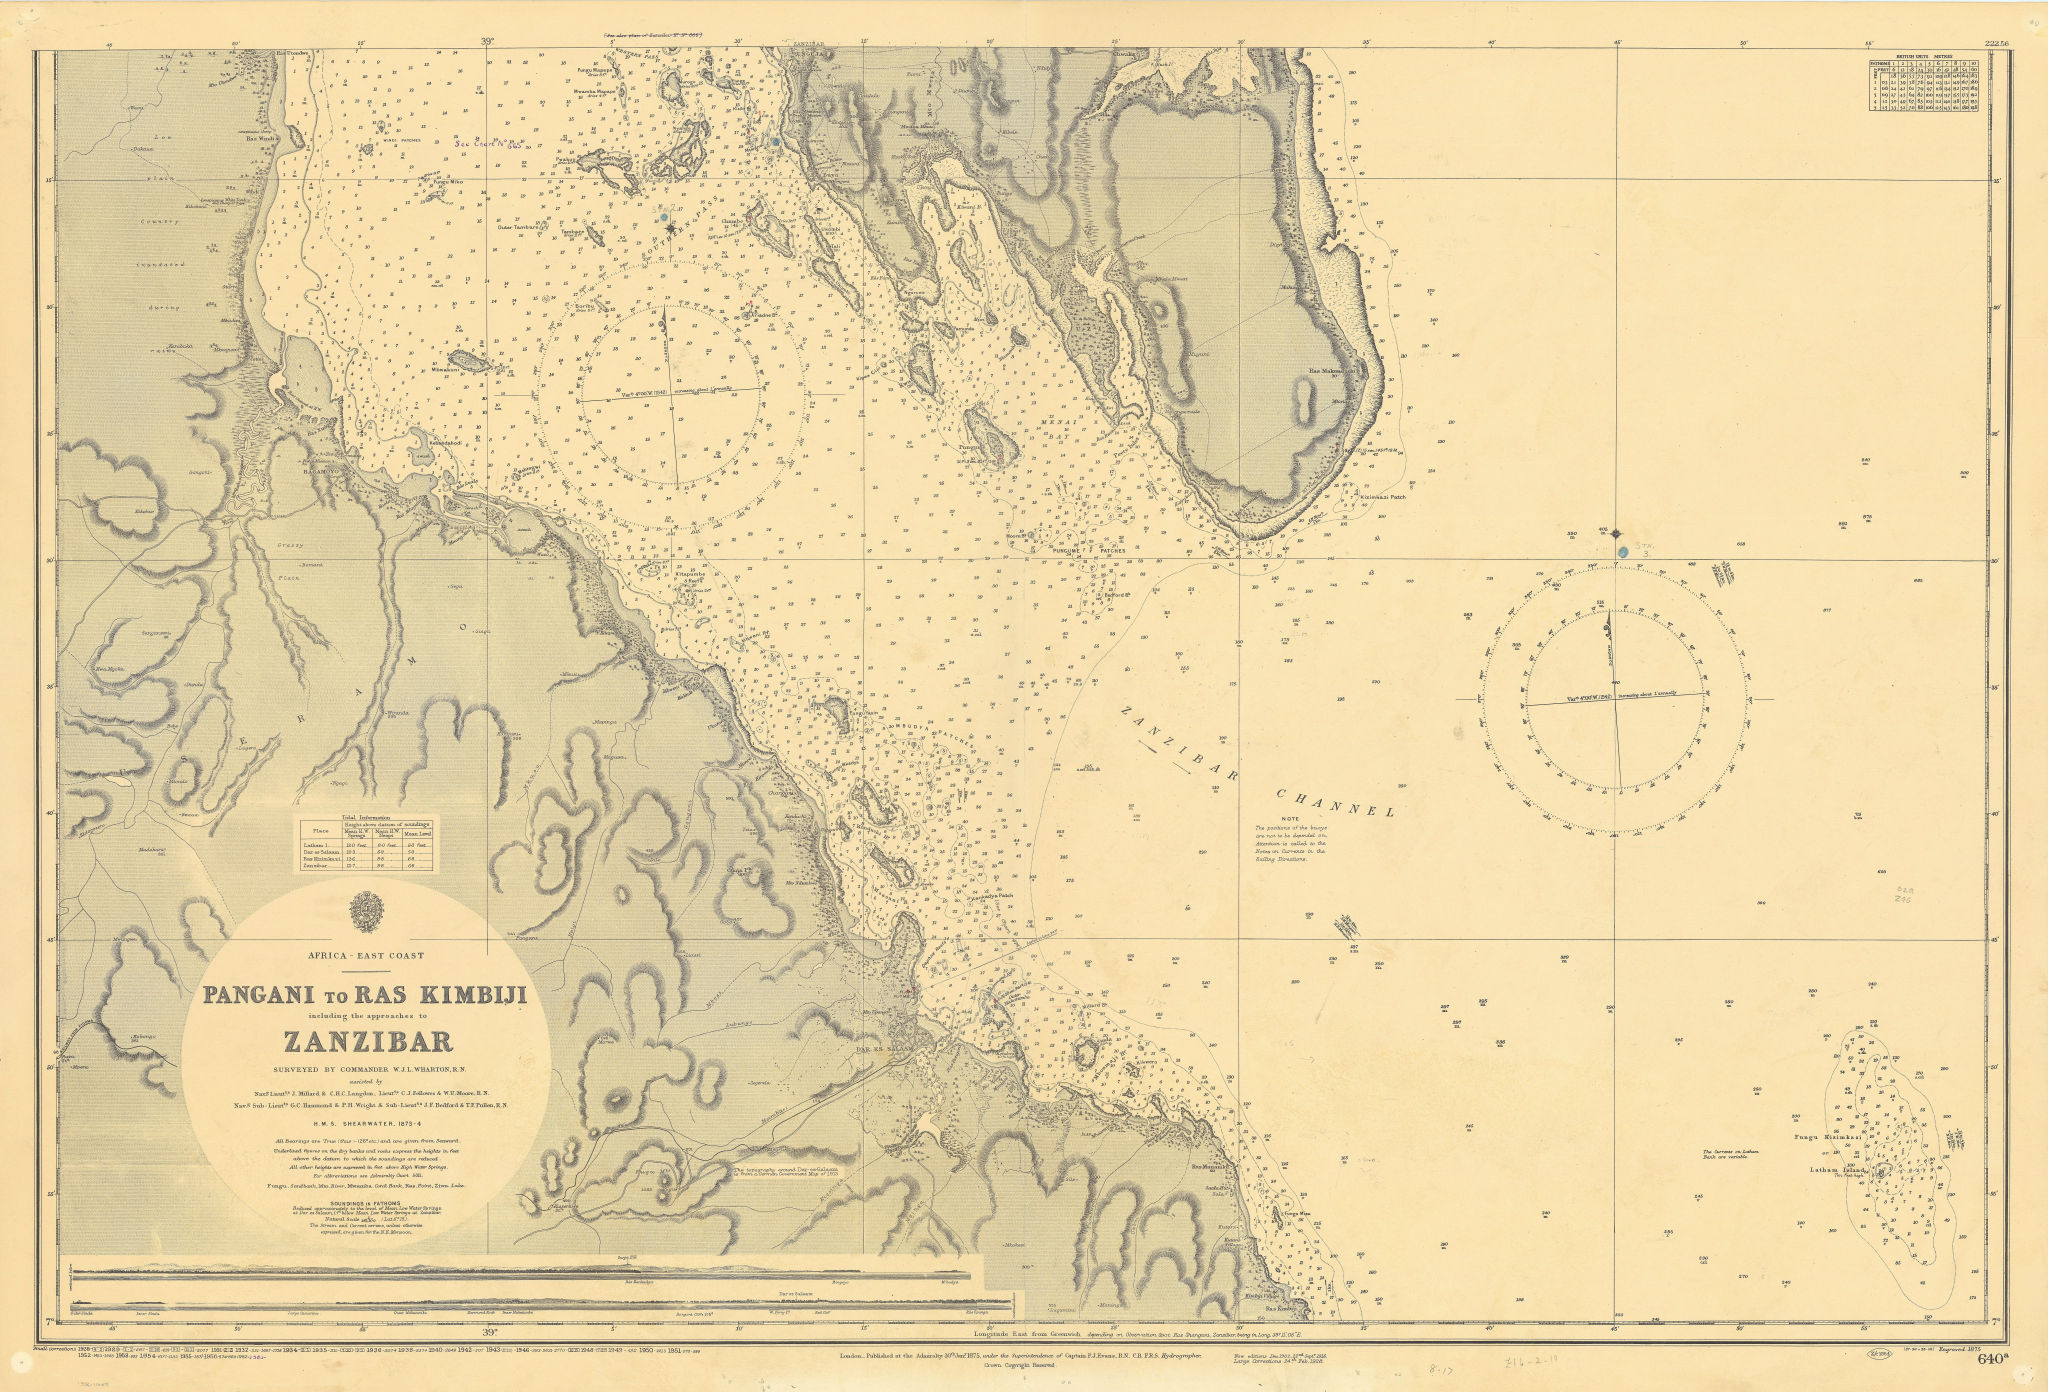 Tanzania coast Zanzibar channel Dar-es-Salaam ADMIRALTY chart 1875 (1956) map